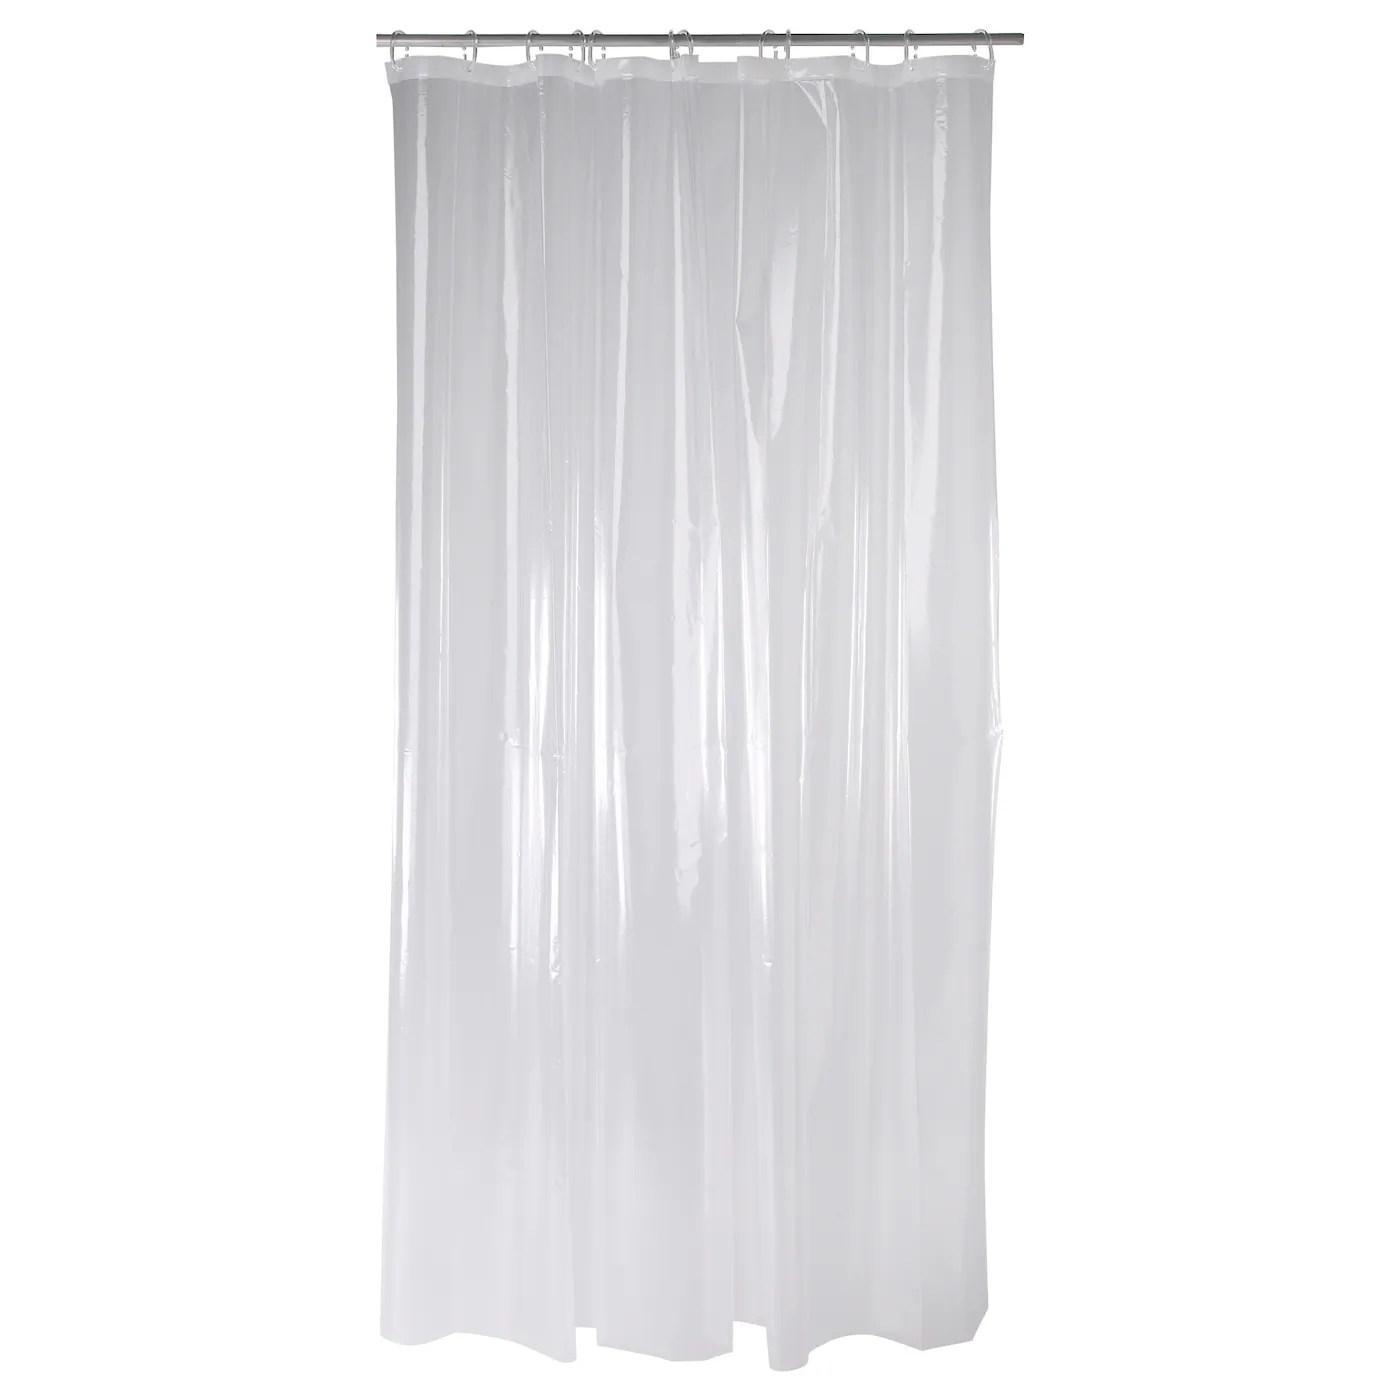 nackten shower curtain clear 71x71